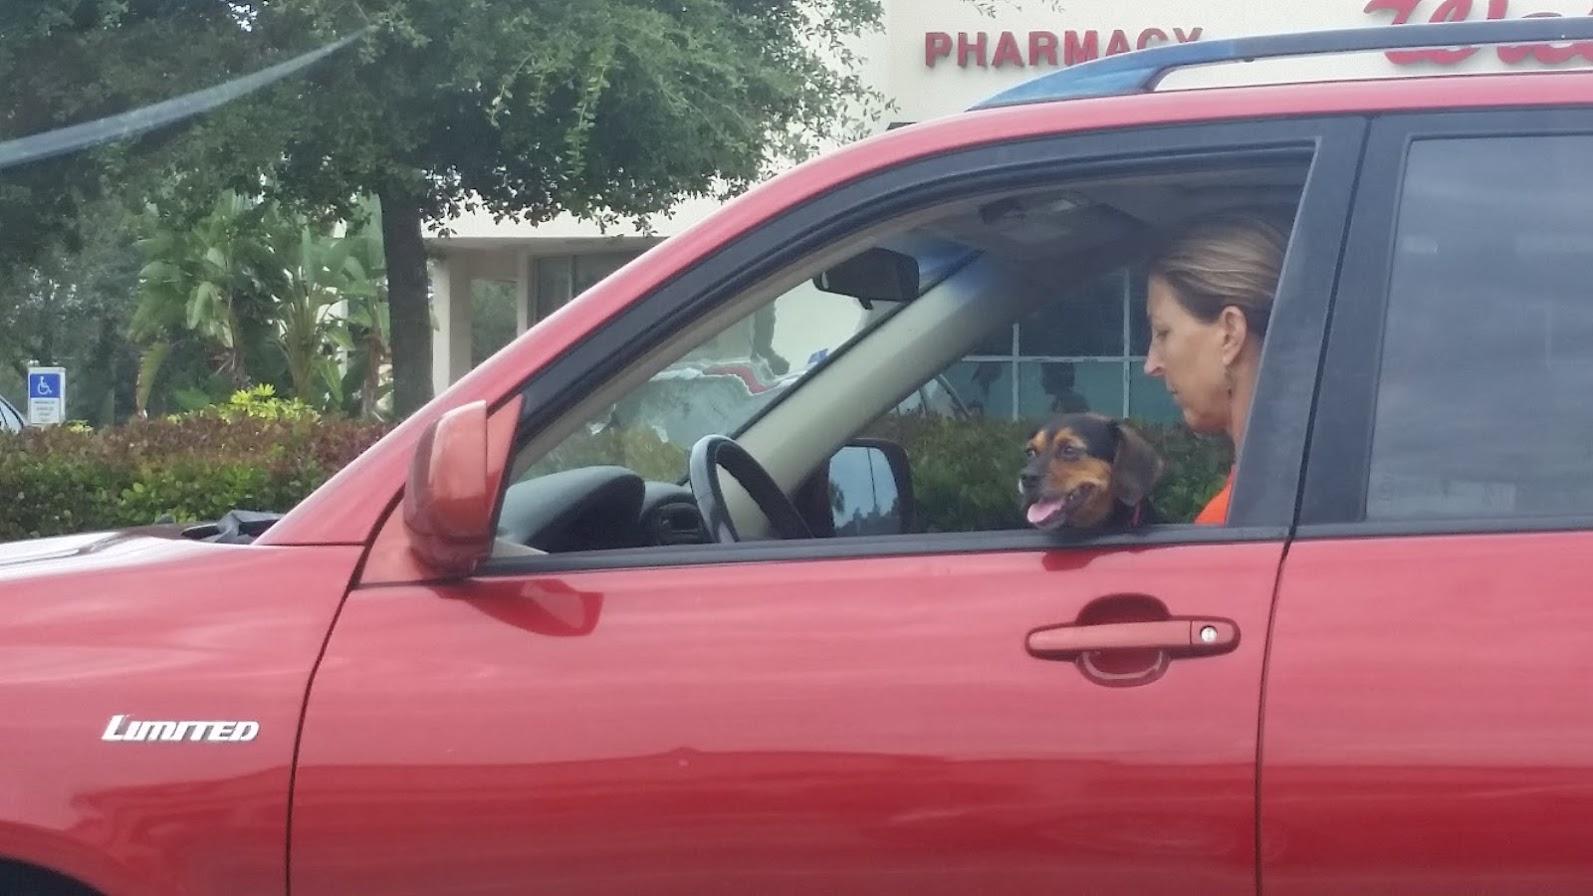 Dogs in car windows